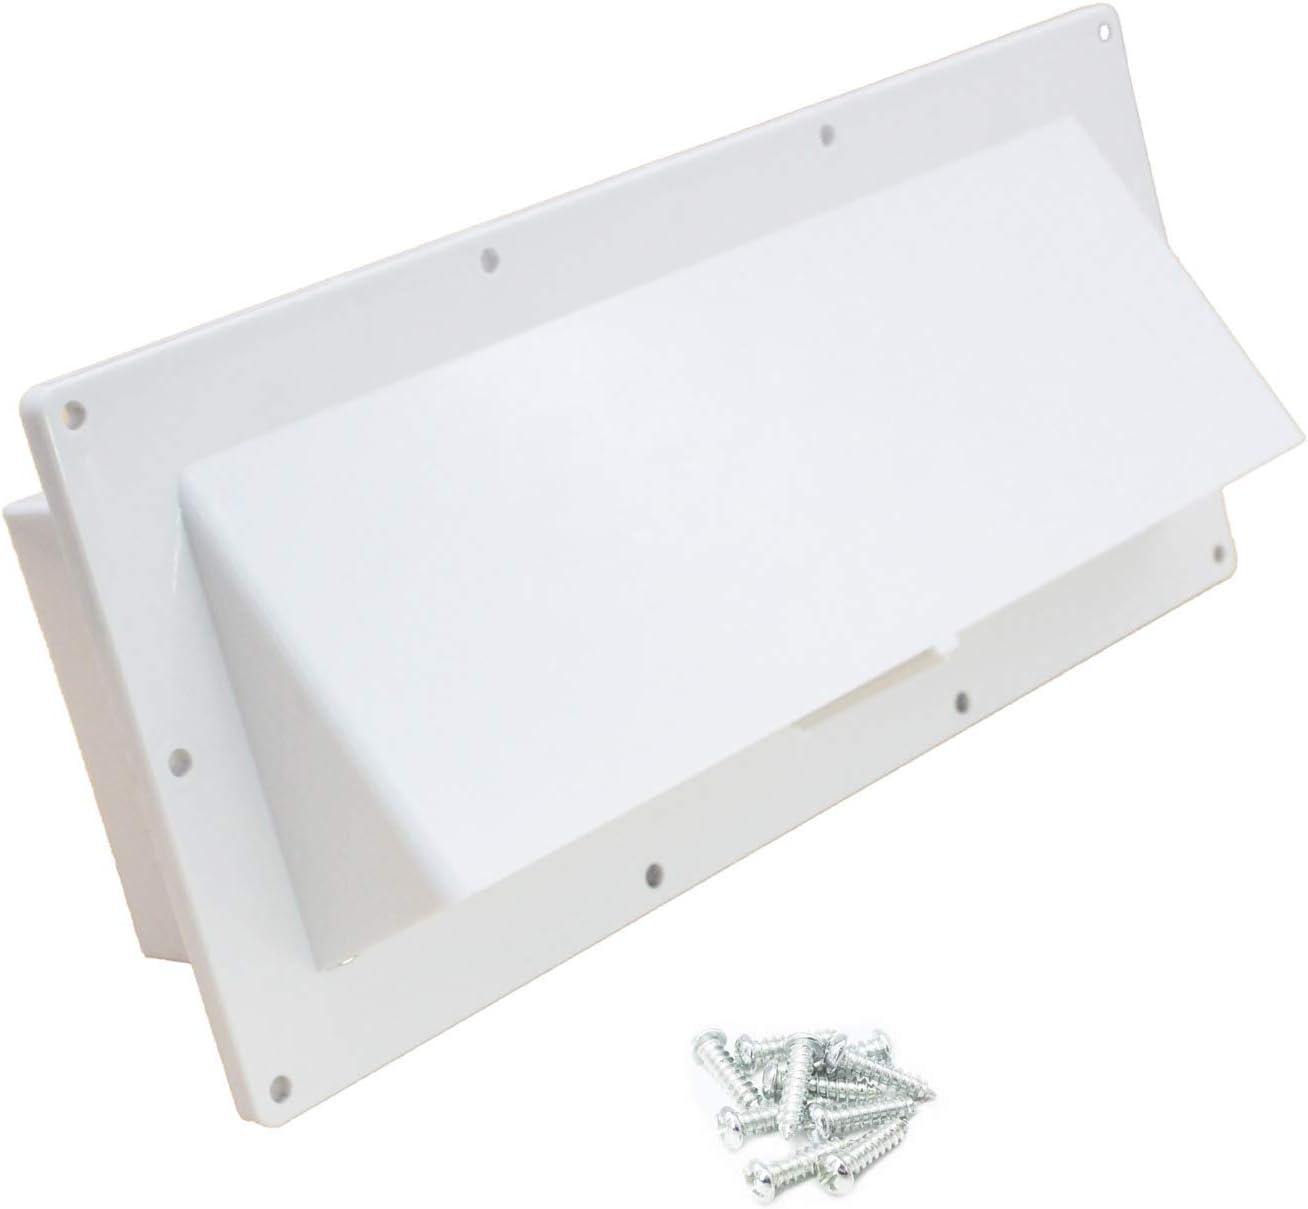 X-Haibei RV Stove Bathroom Range Hood Vent White Cover Exhaust Fees free C Max 78% OFF